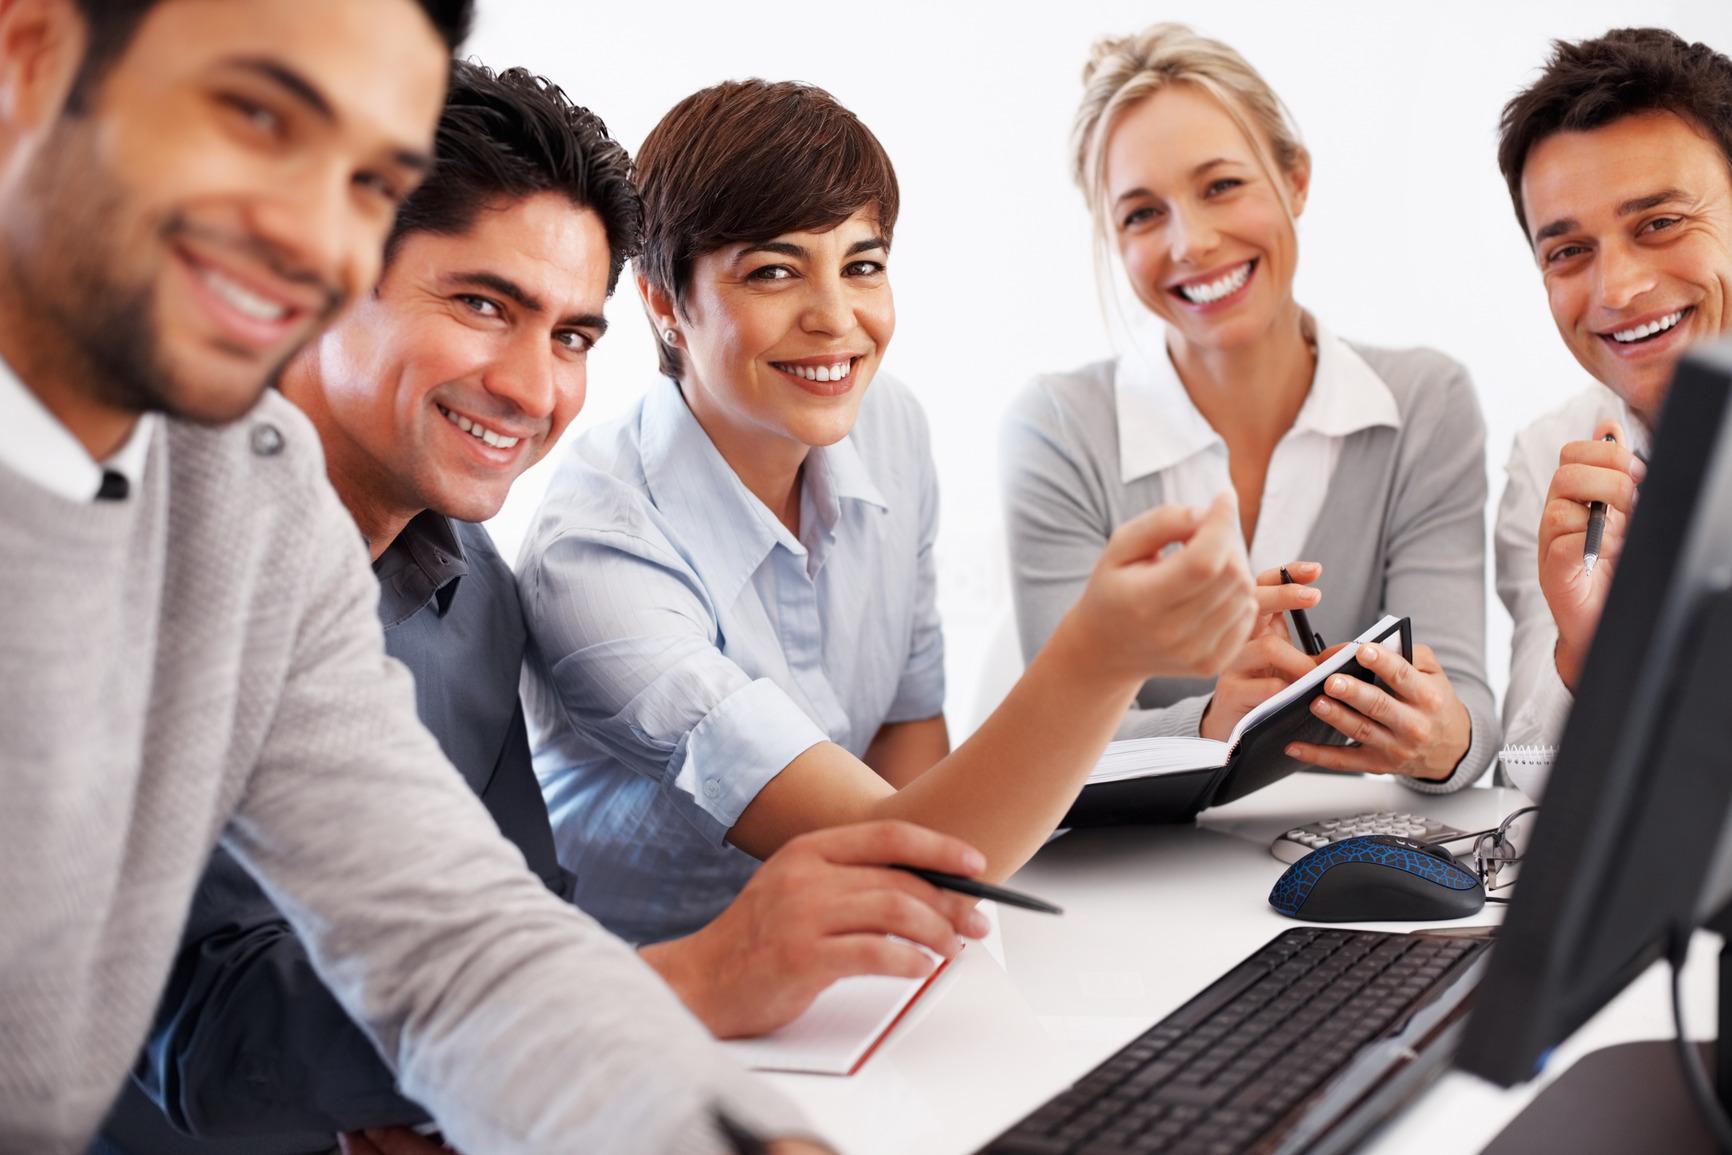 photodune-655263-corporate-professionals-mCorporate-Life-Insurance.jpg